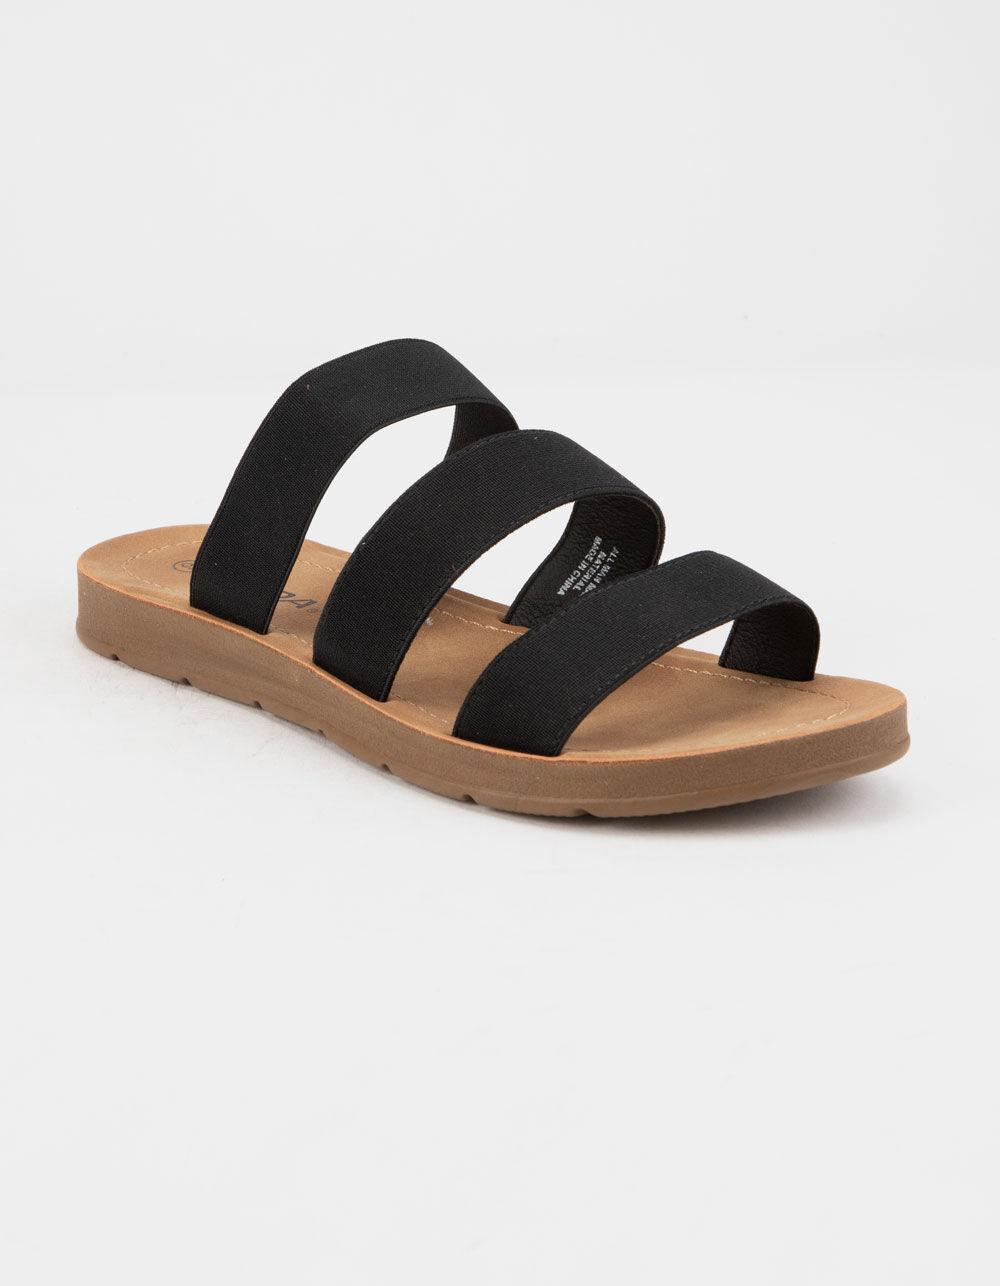 SODA Elastic 3 Strap Black Sandals